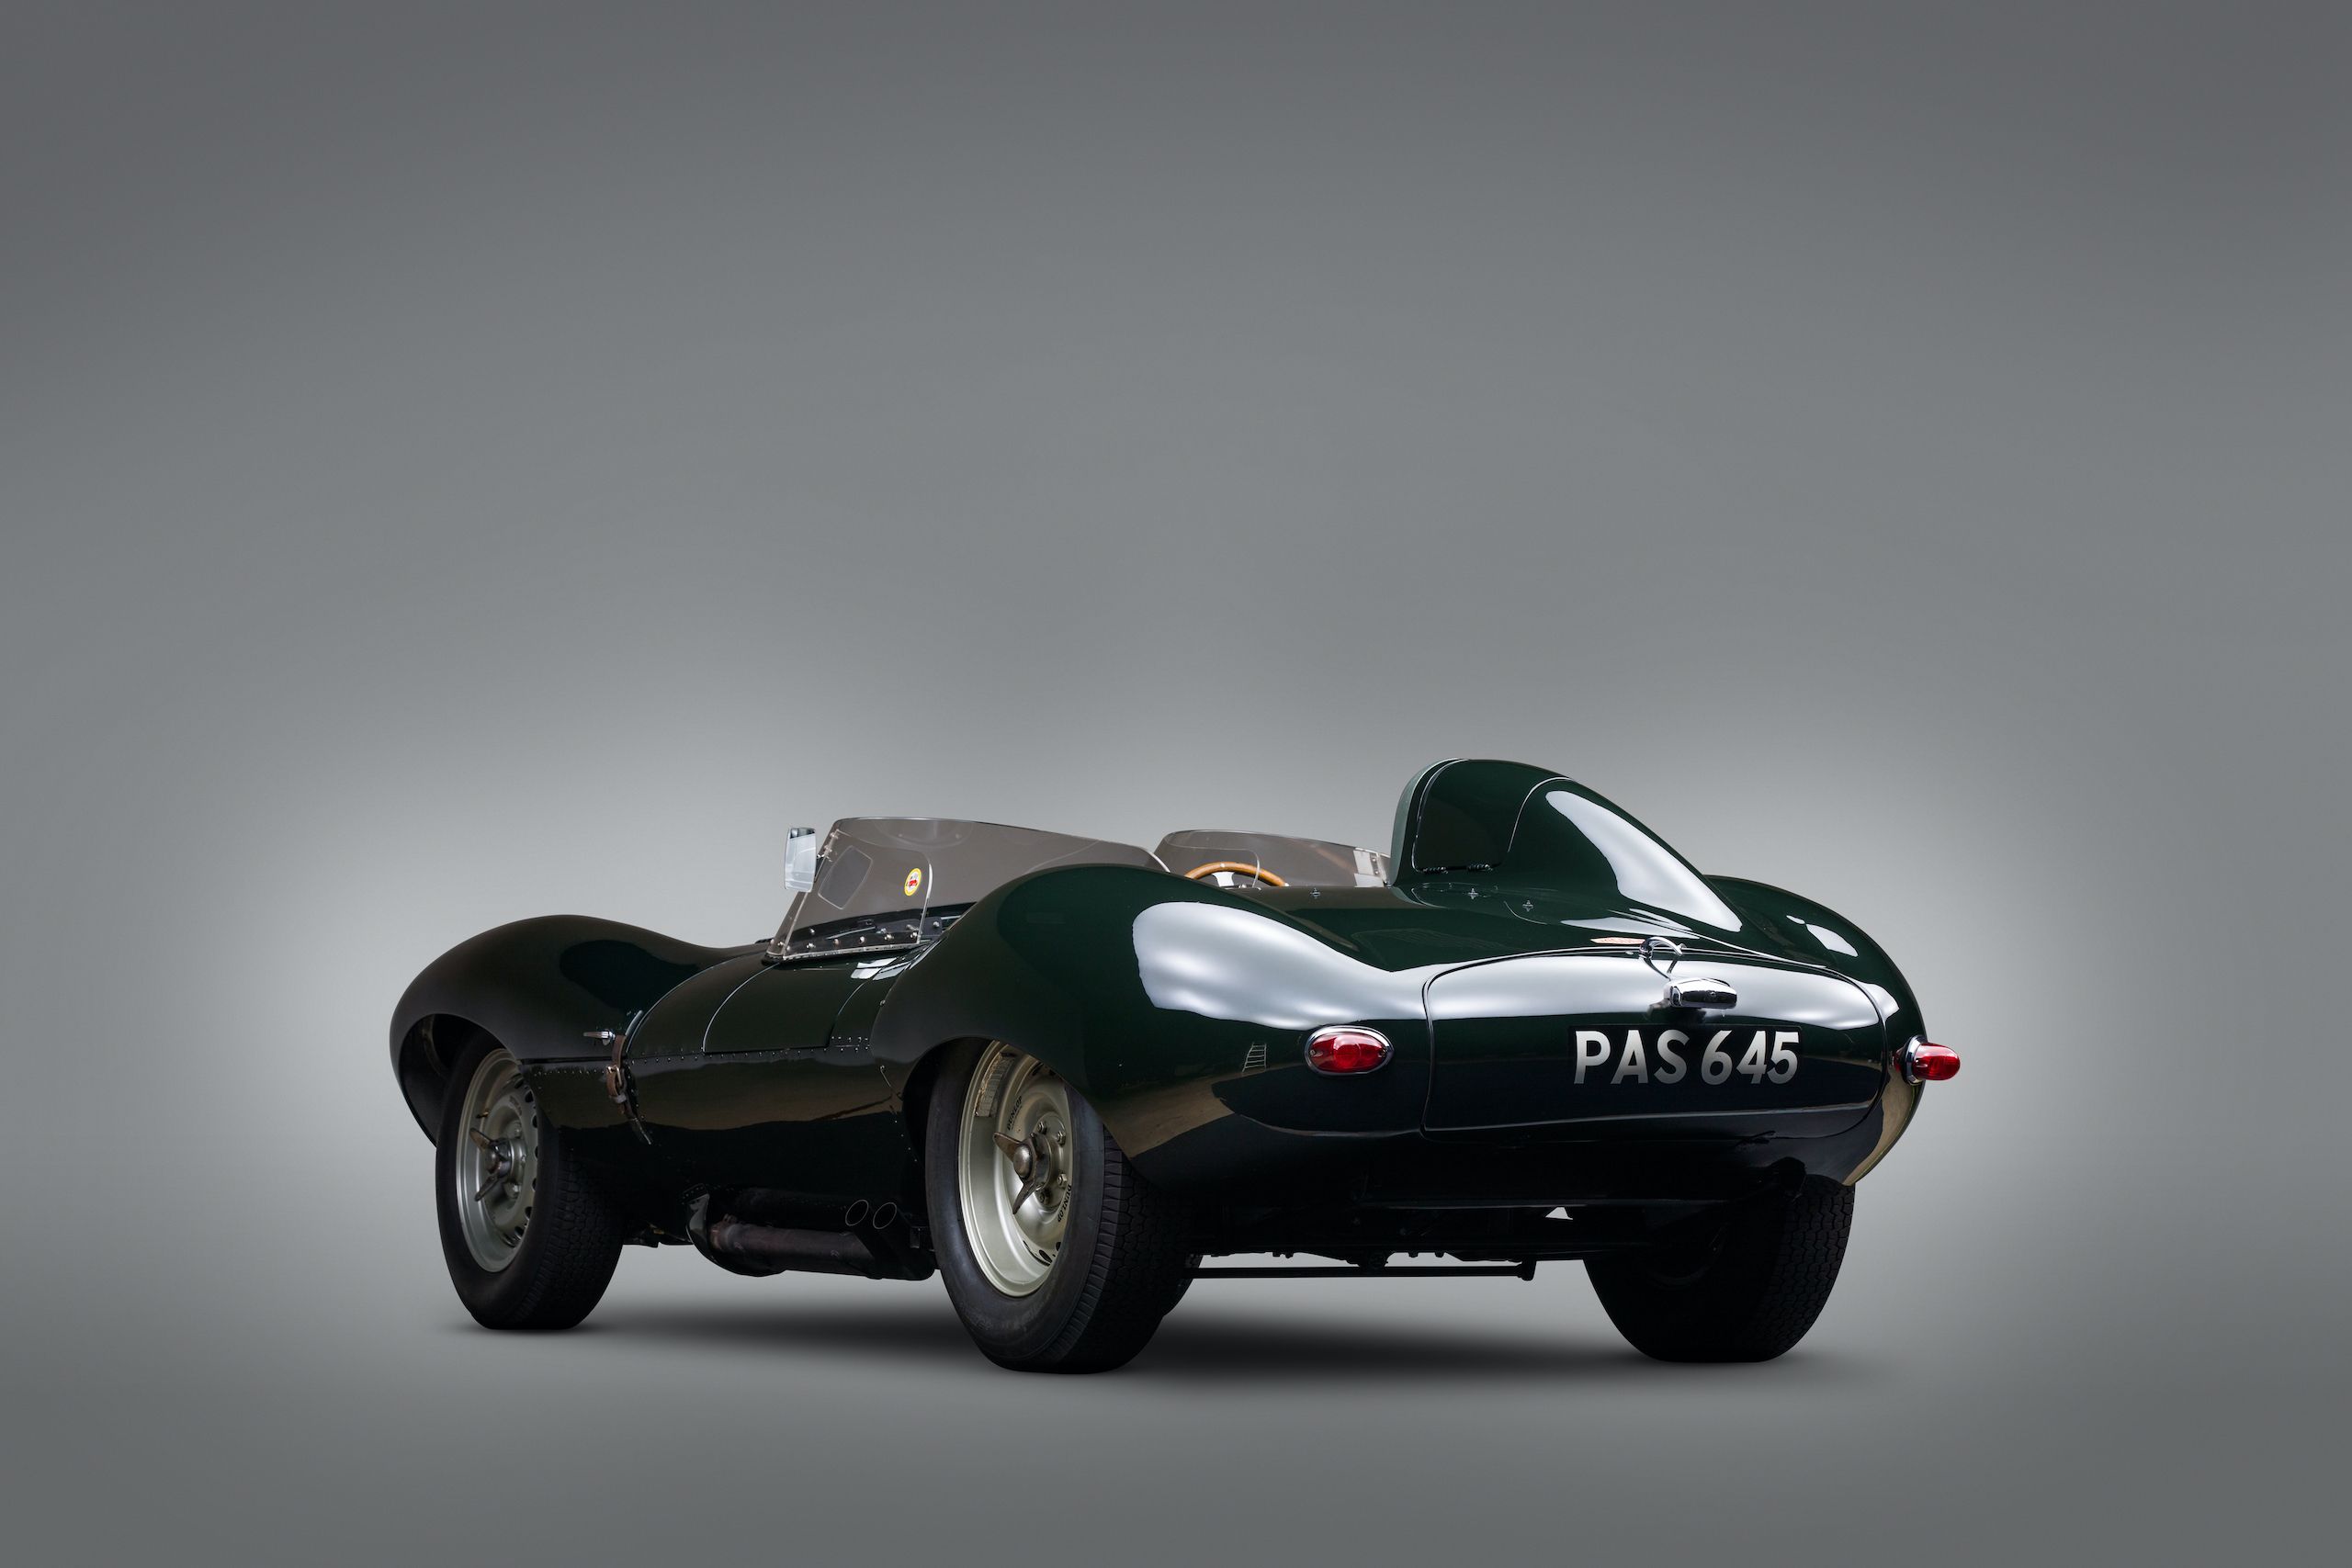 jaguar d-type rear three-quarter